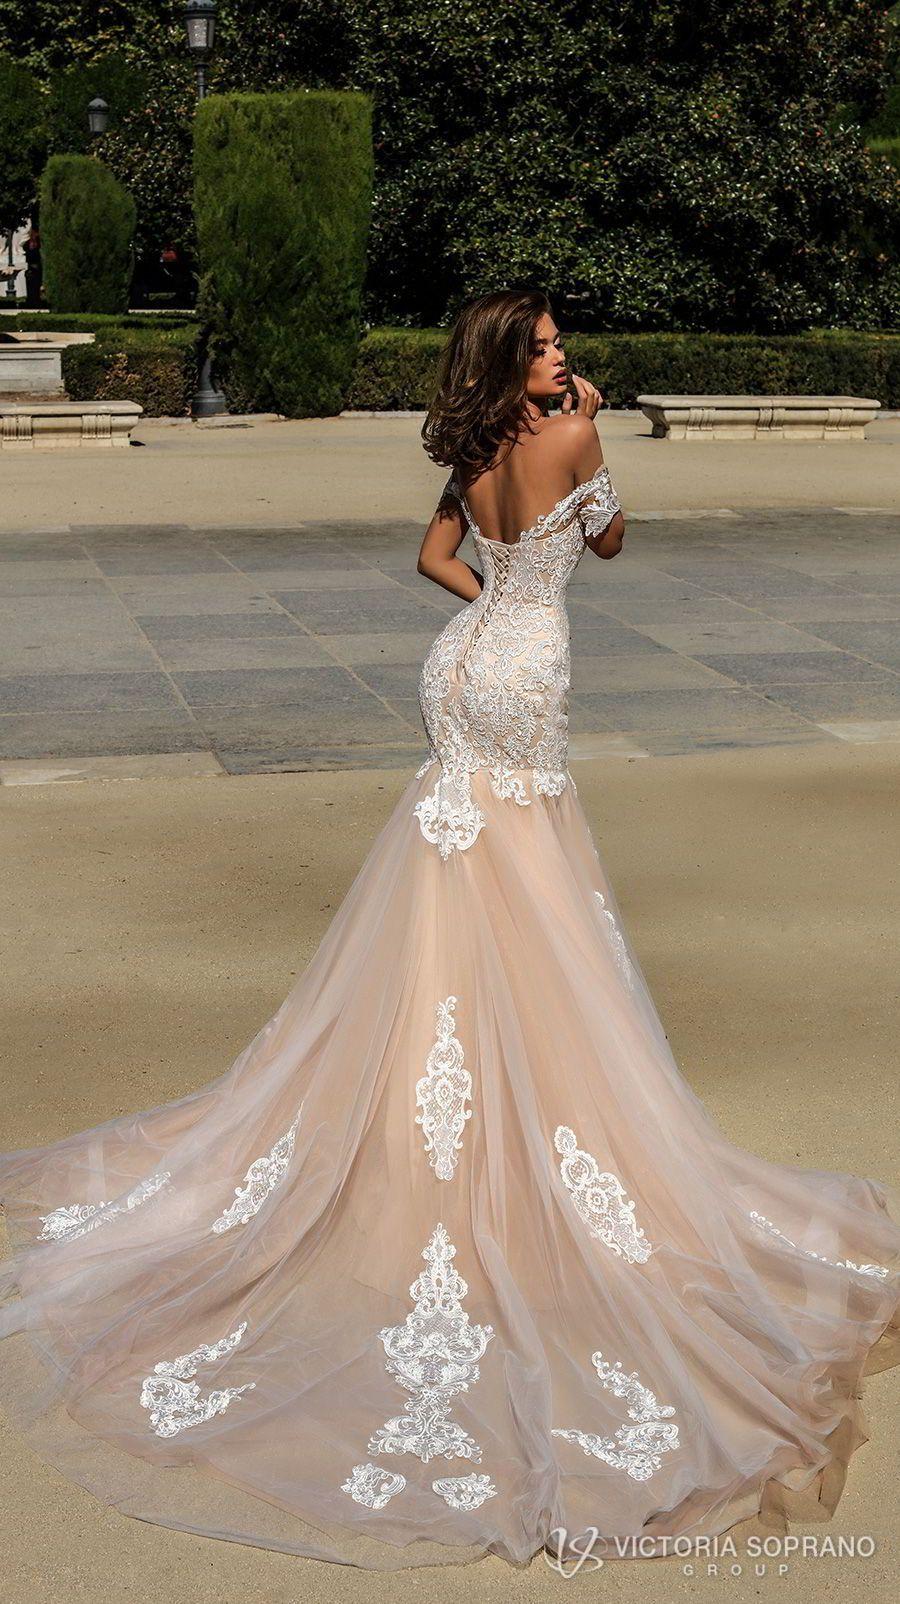 Victoria soprano wedding dresses weddingdresses bridalgown